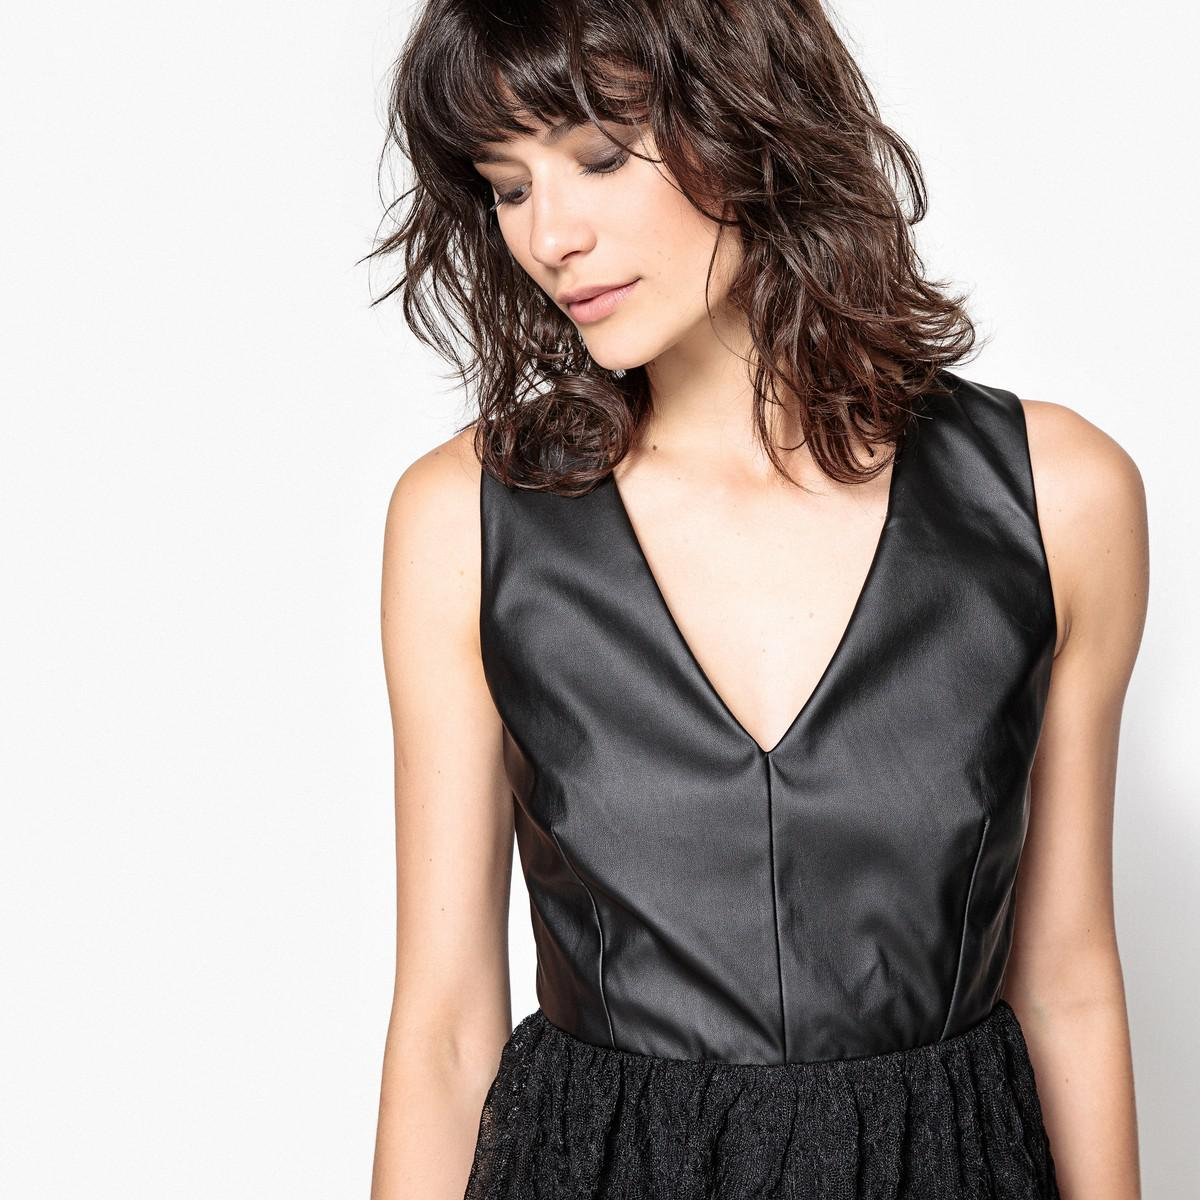 cef8dd5f75 LA REDOUTE - Black Sleeveless Plain Midi Skater Dress - Lyst. View  fullscreen